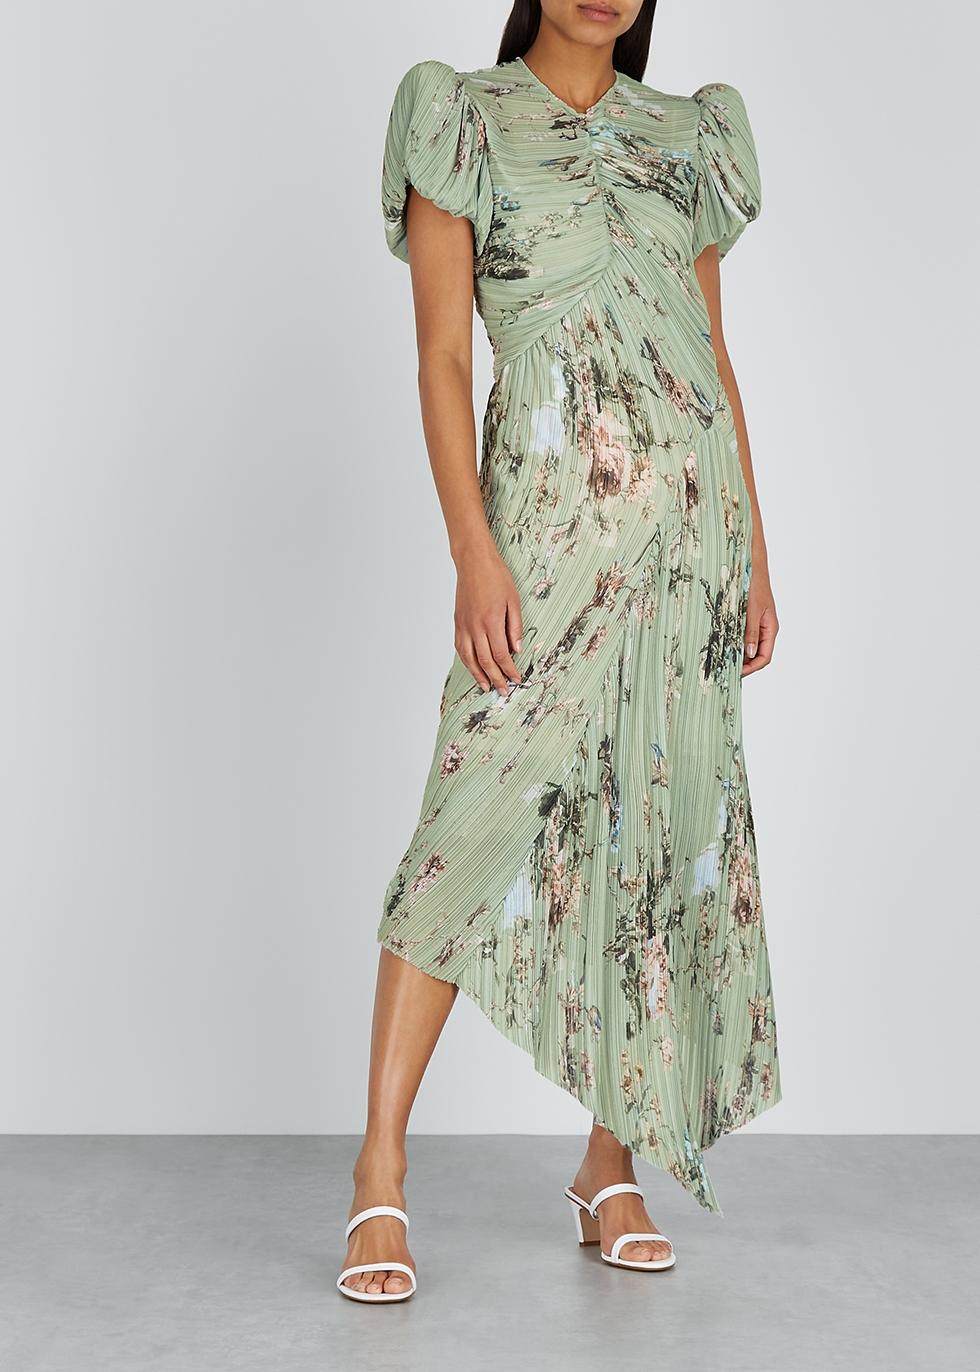 Tessa floral-print georgette midi dress - Preen By Thornton Bregazzi